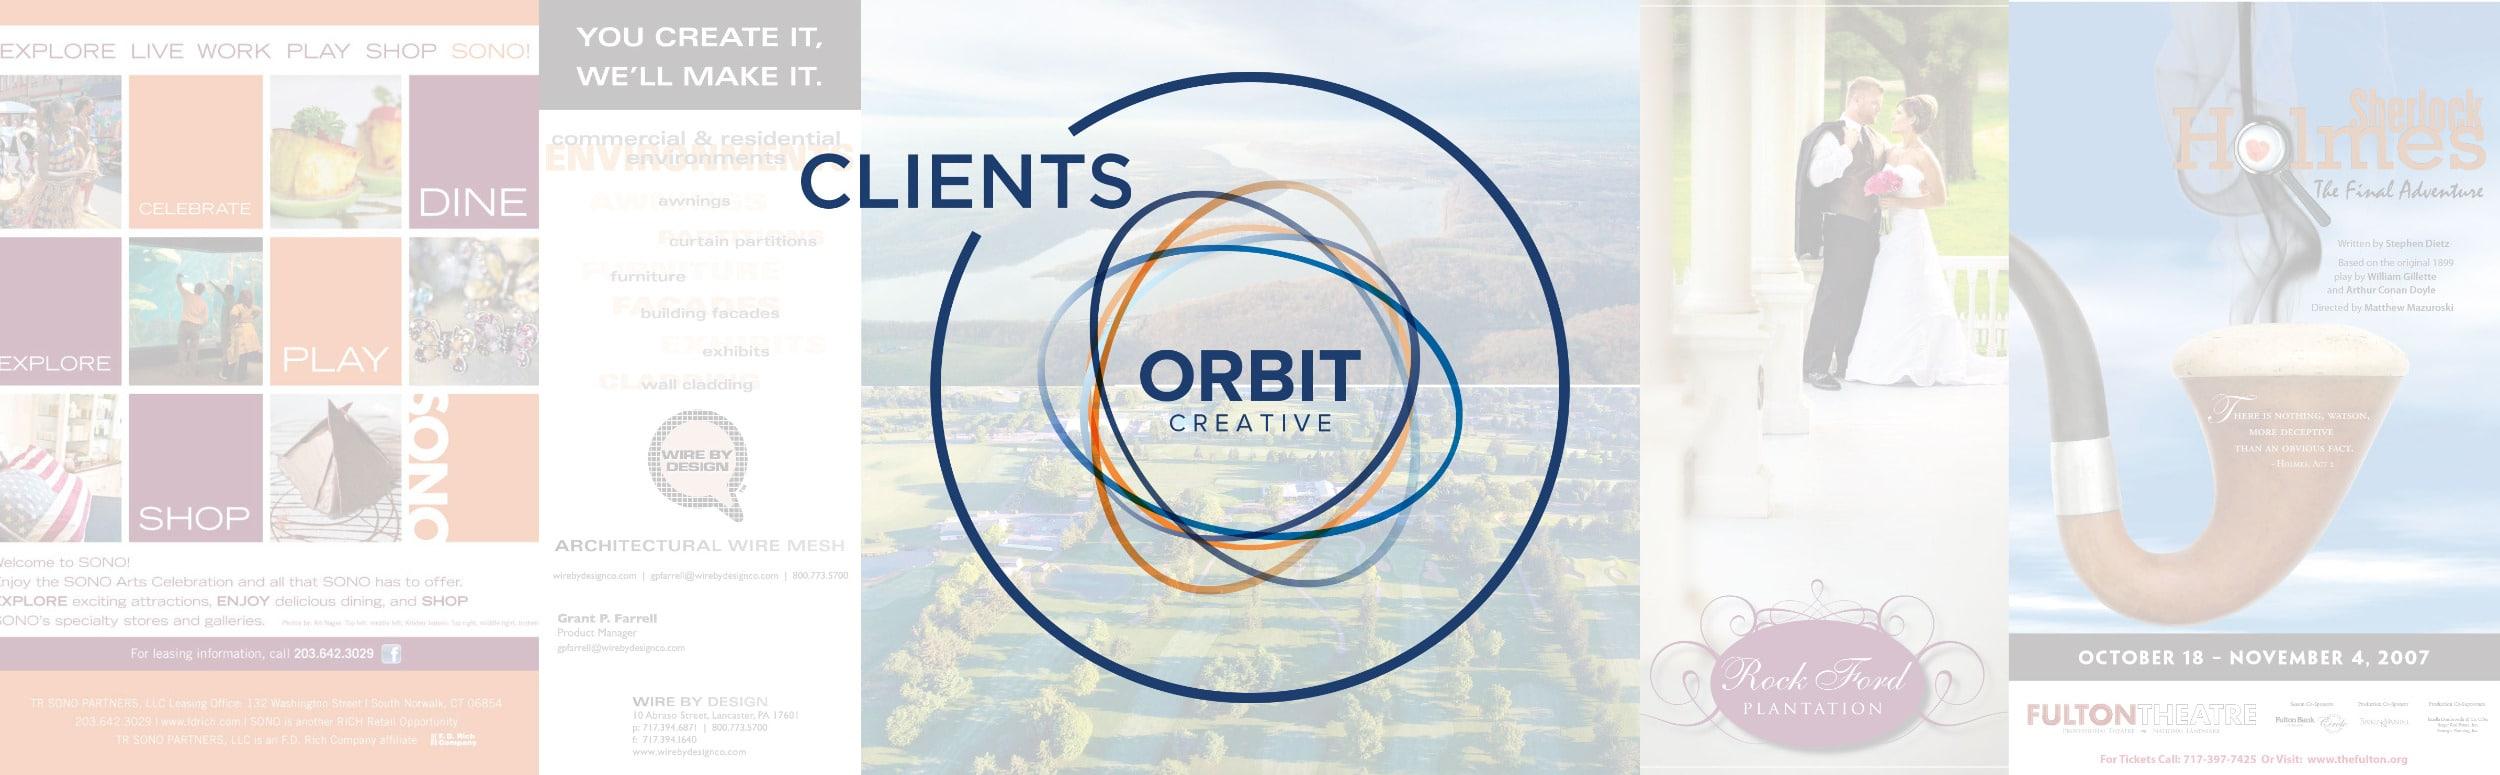 Orbit Creative Clients